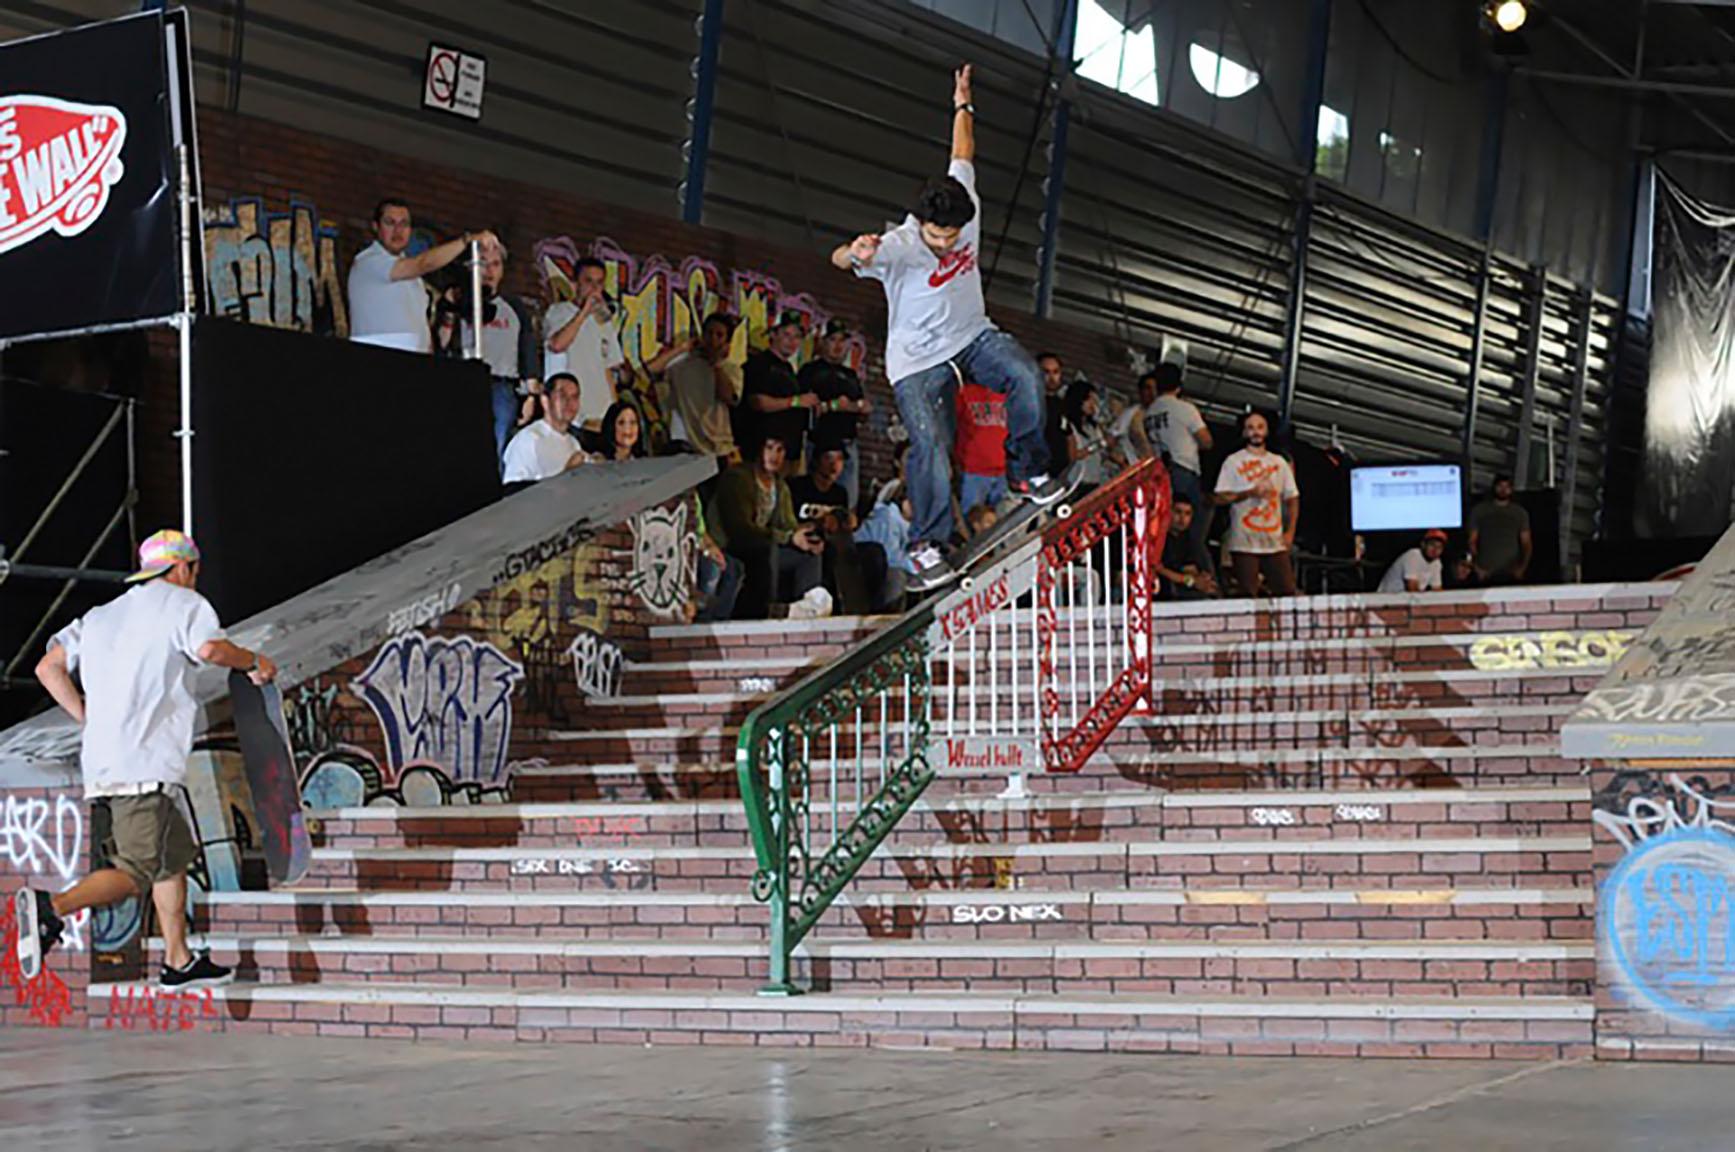 2008: Mexico City, Mexico